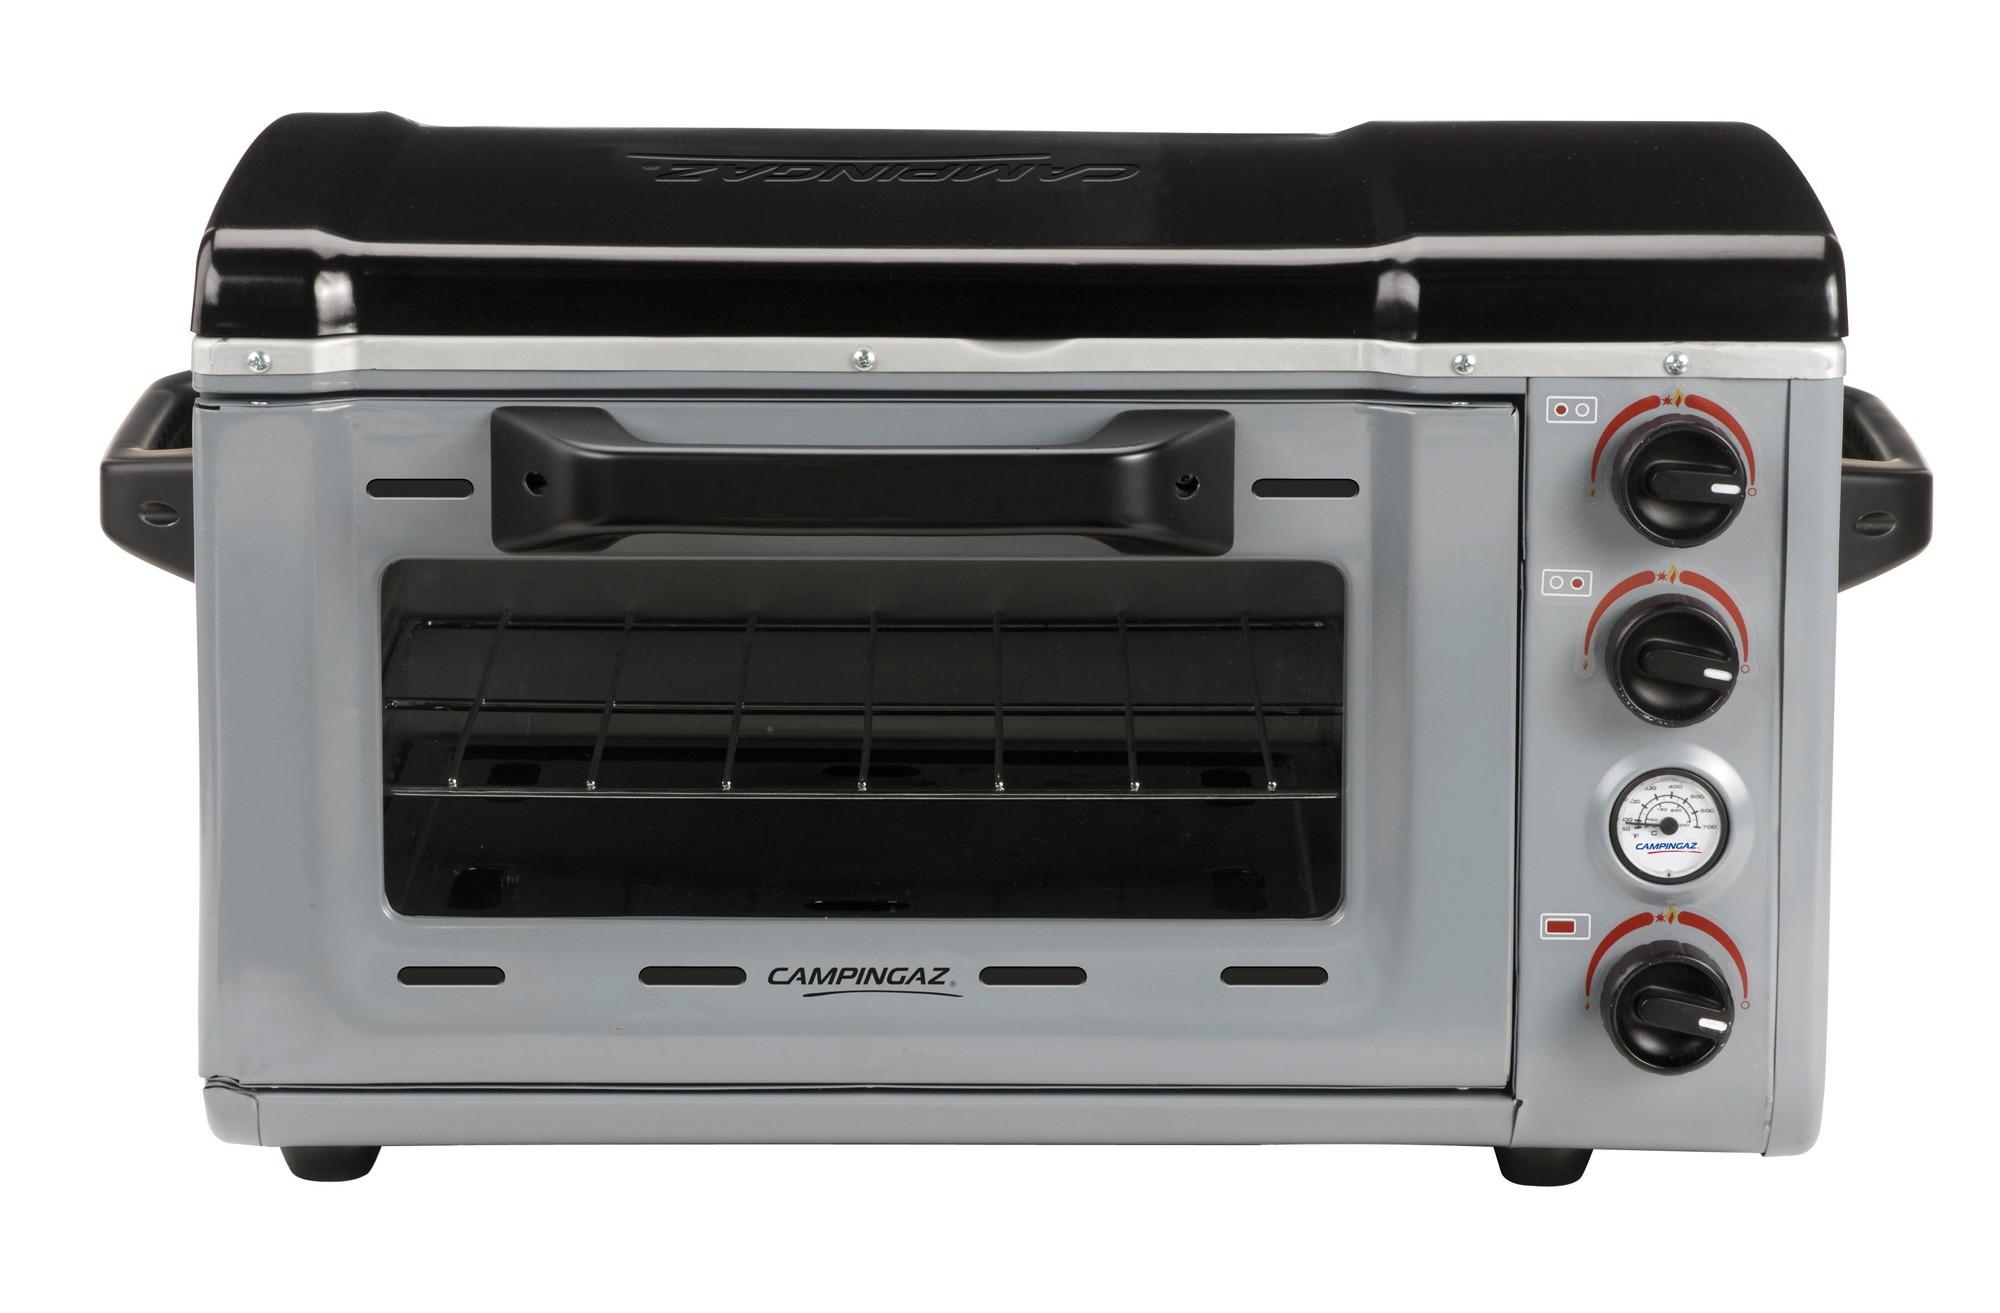 campingaz gasofen k chenherd mit kochfunktion camp stove oven bei. Black Bedroom Furniture Sets. Home Design Ideas